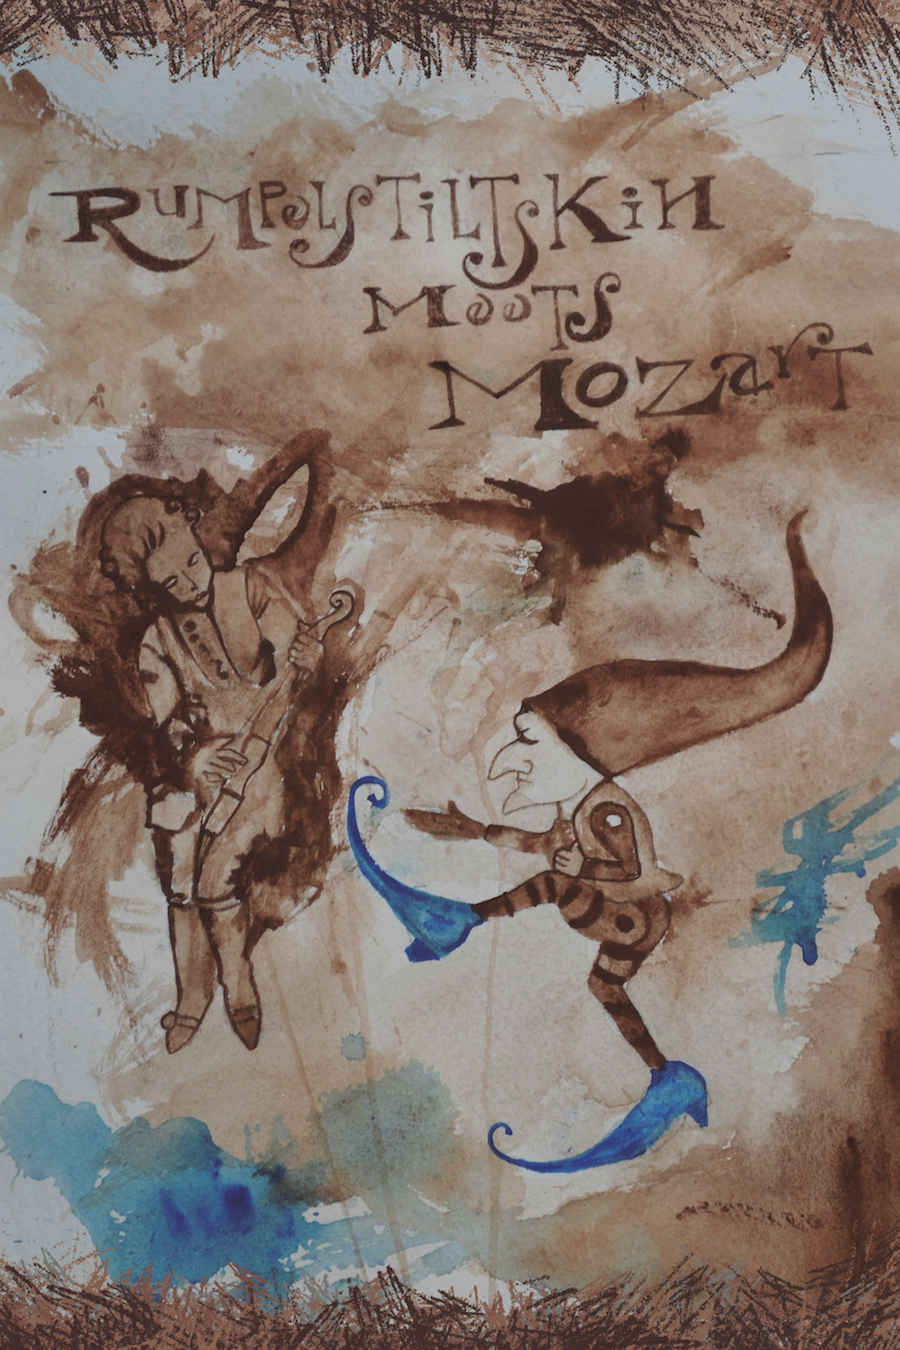 Rumpelstiltskin Meets Mozart